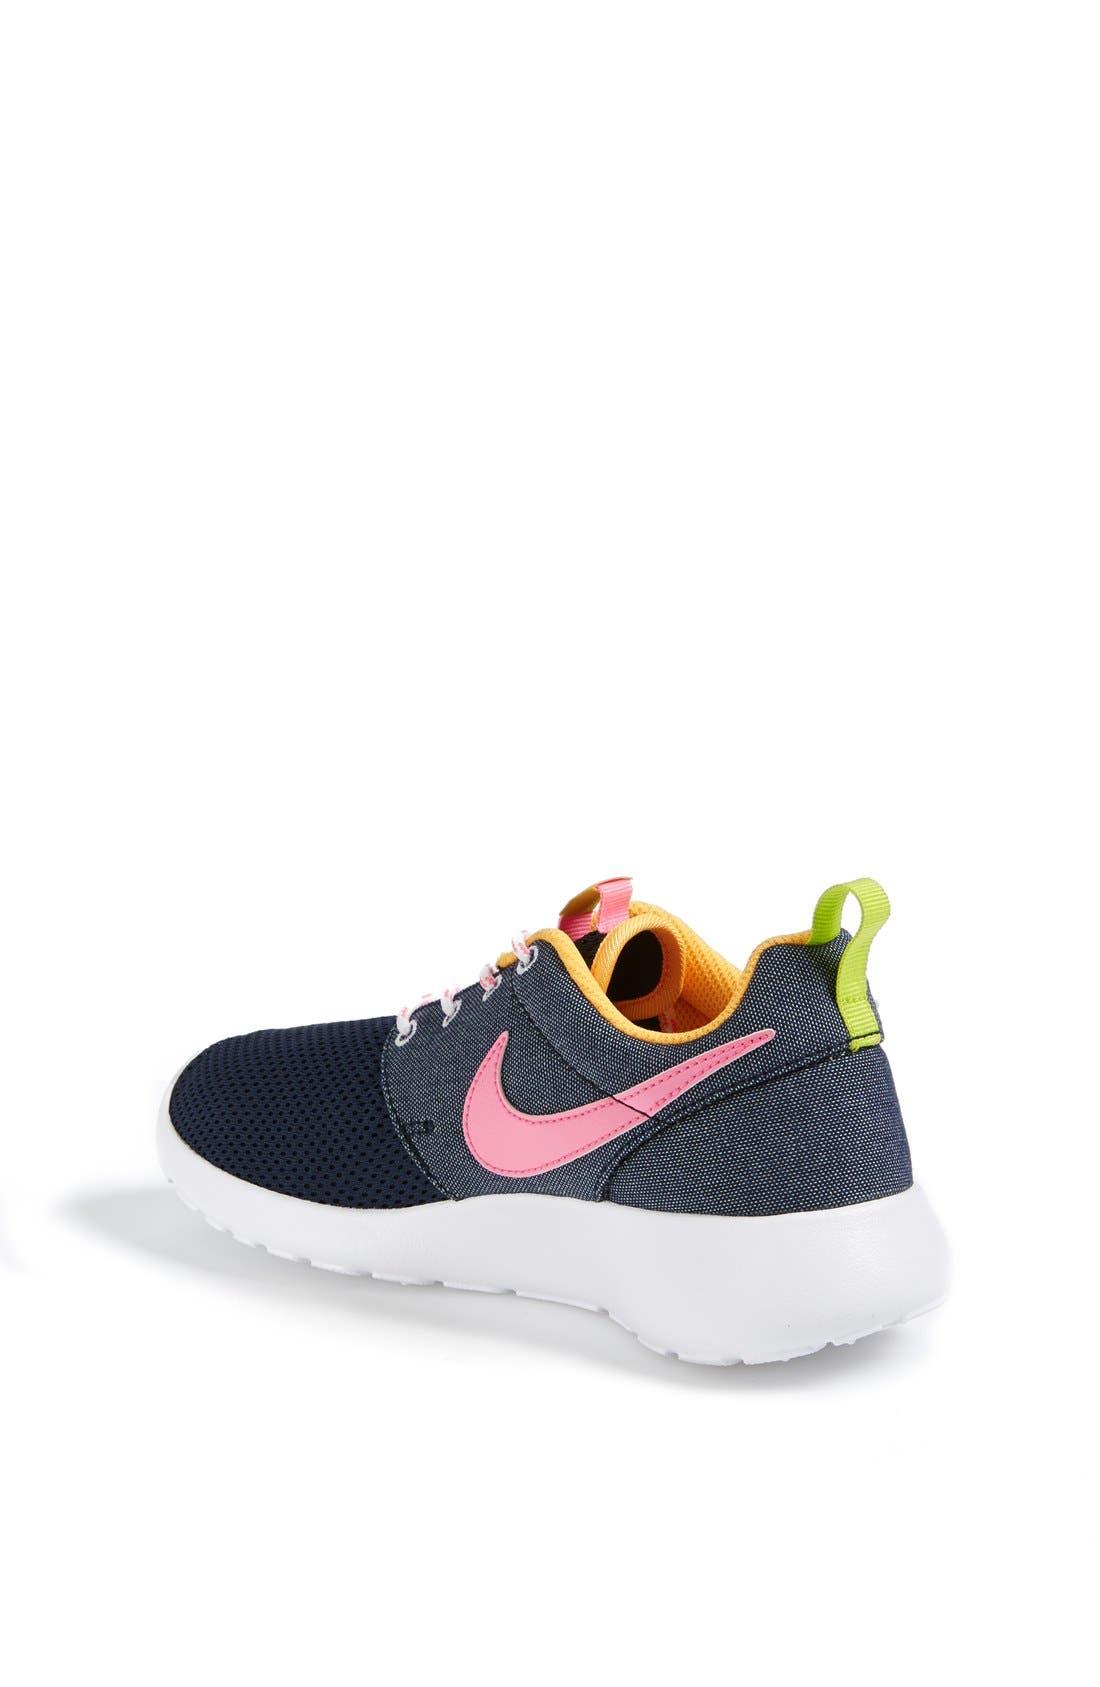 'Roshe Run' Athletic Shoe,                             Alternate thumbnail 128, color,